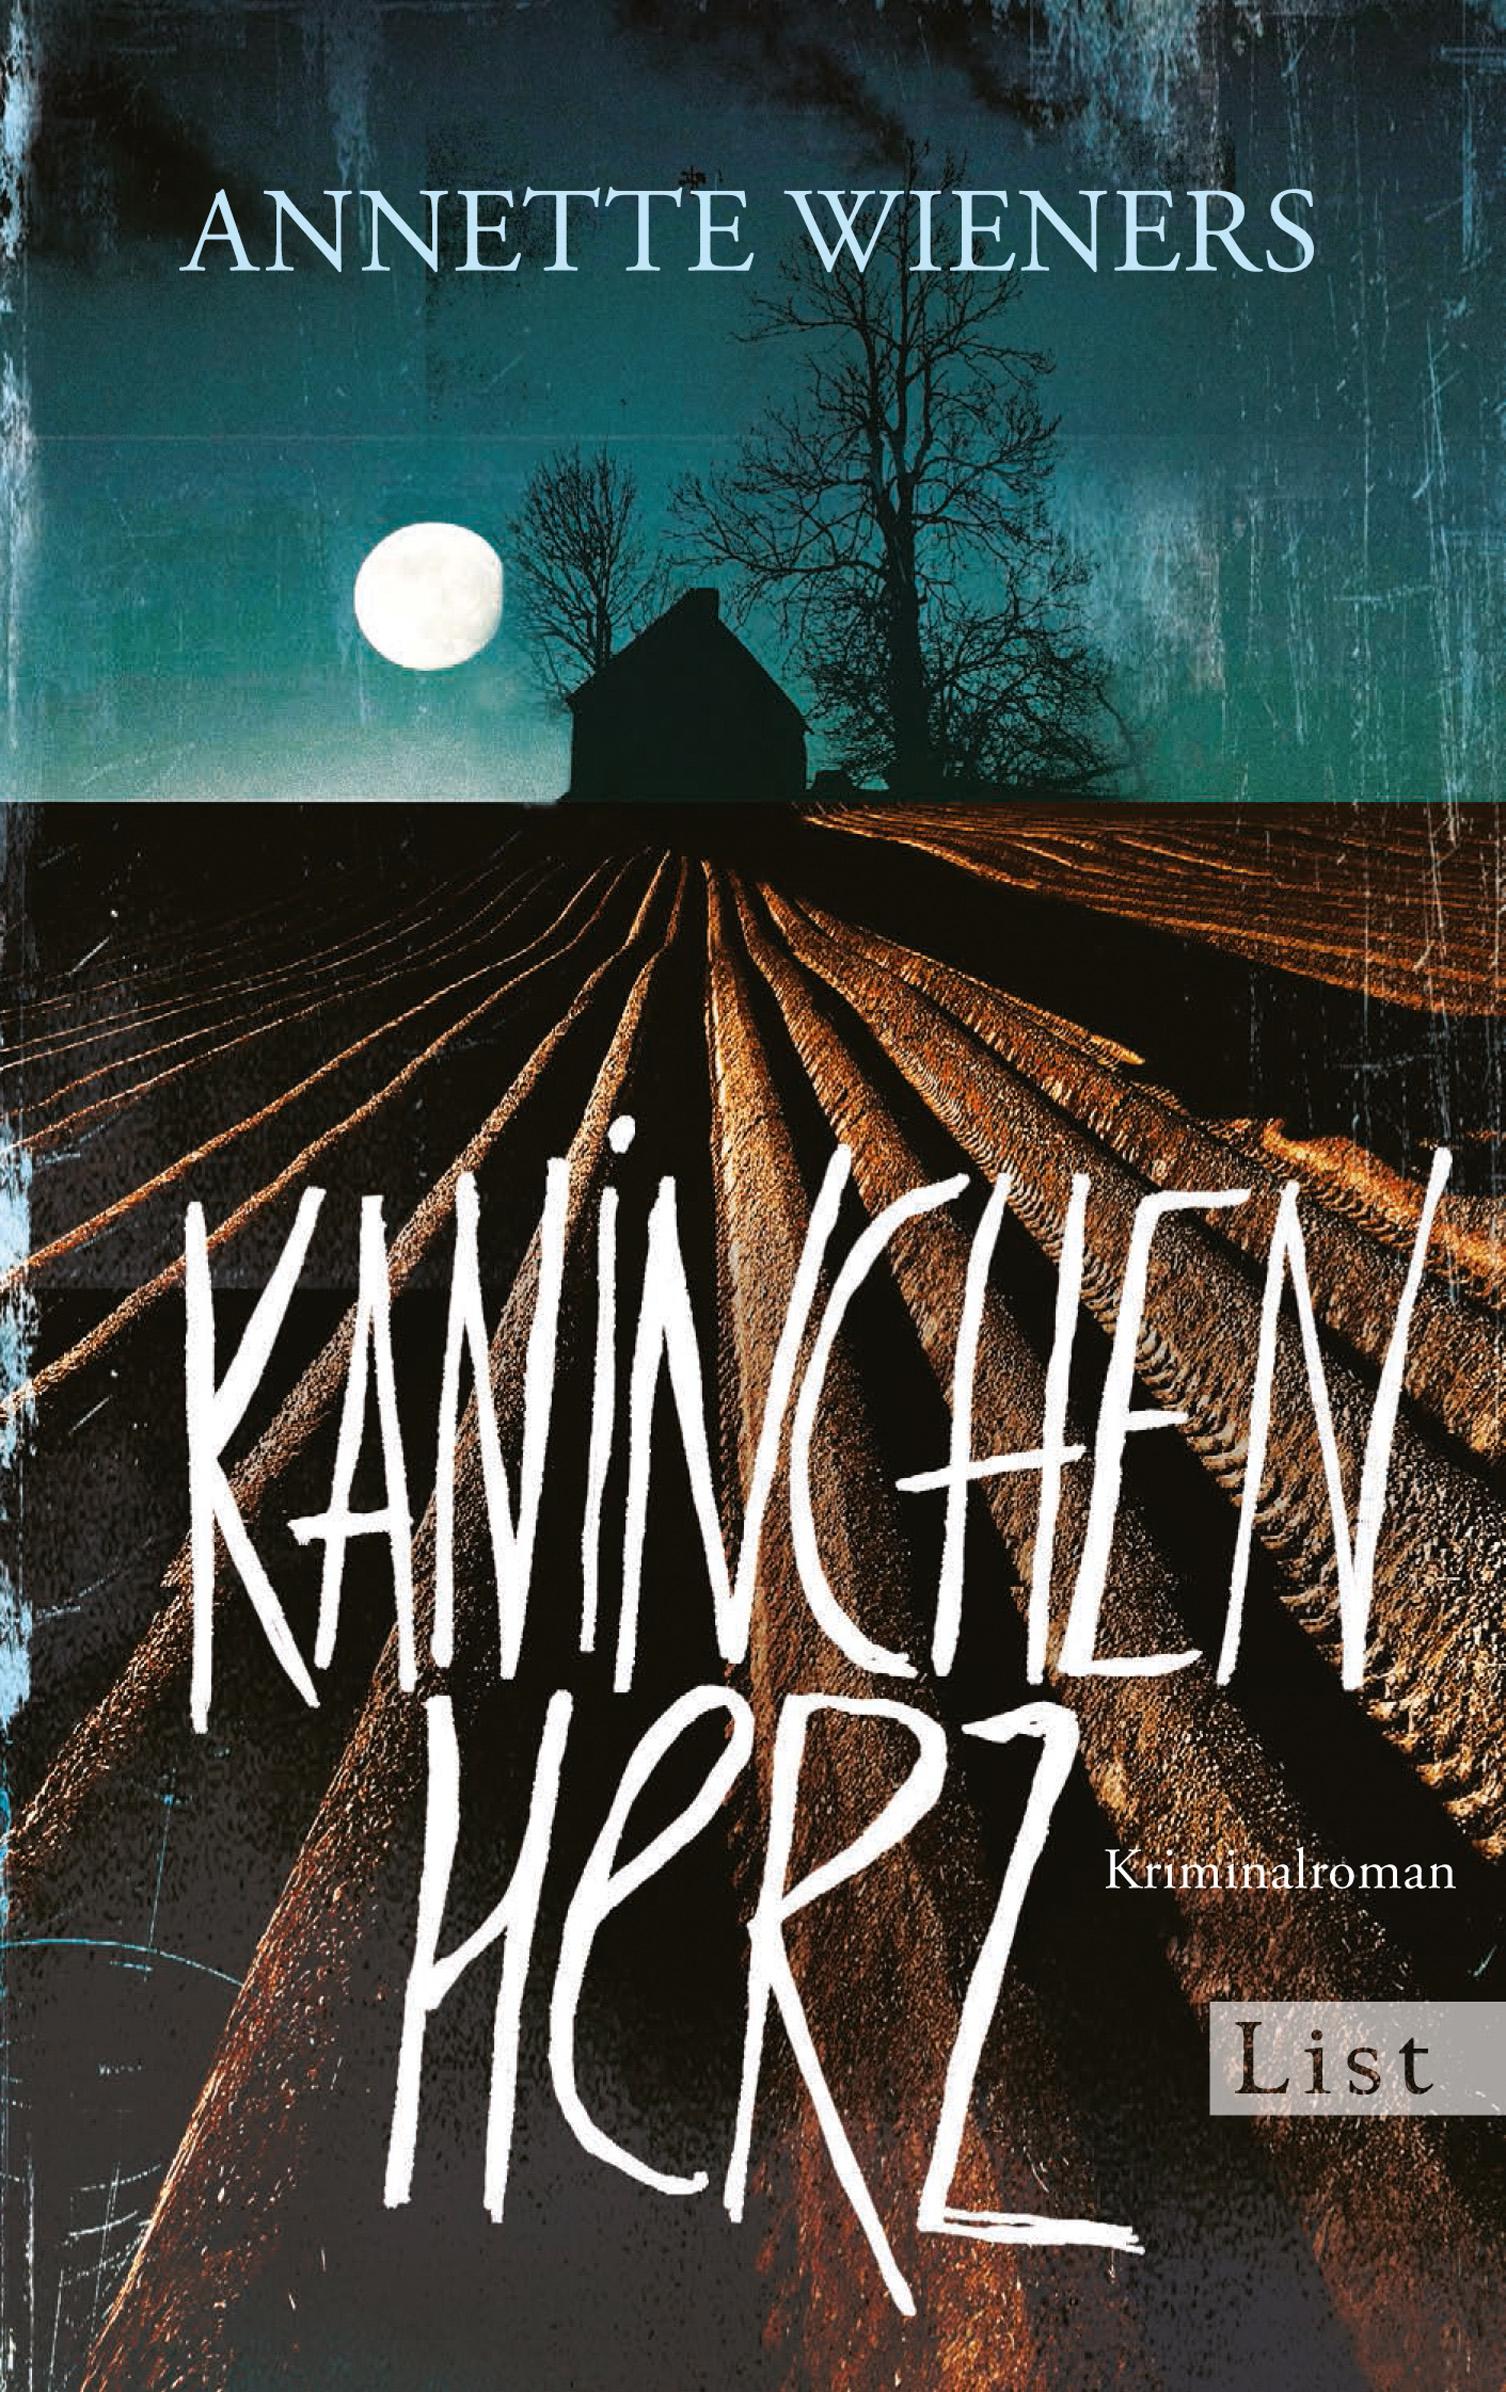 Kaninchenherz - Annette Wieners